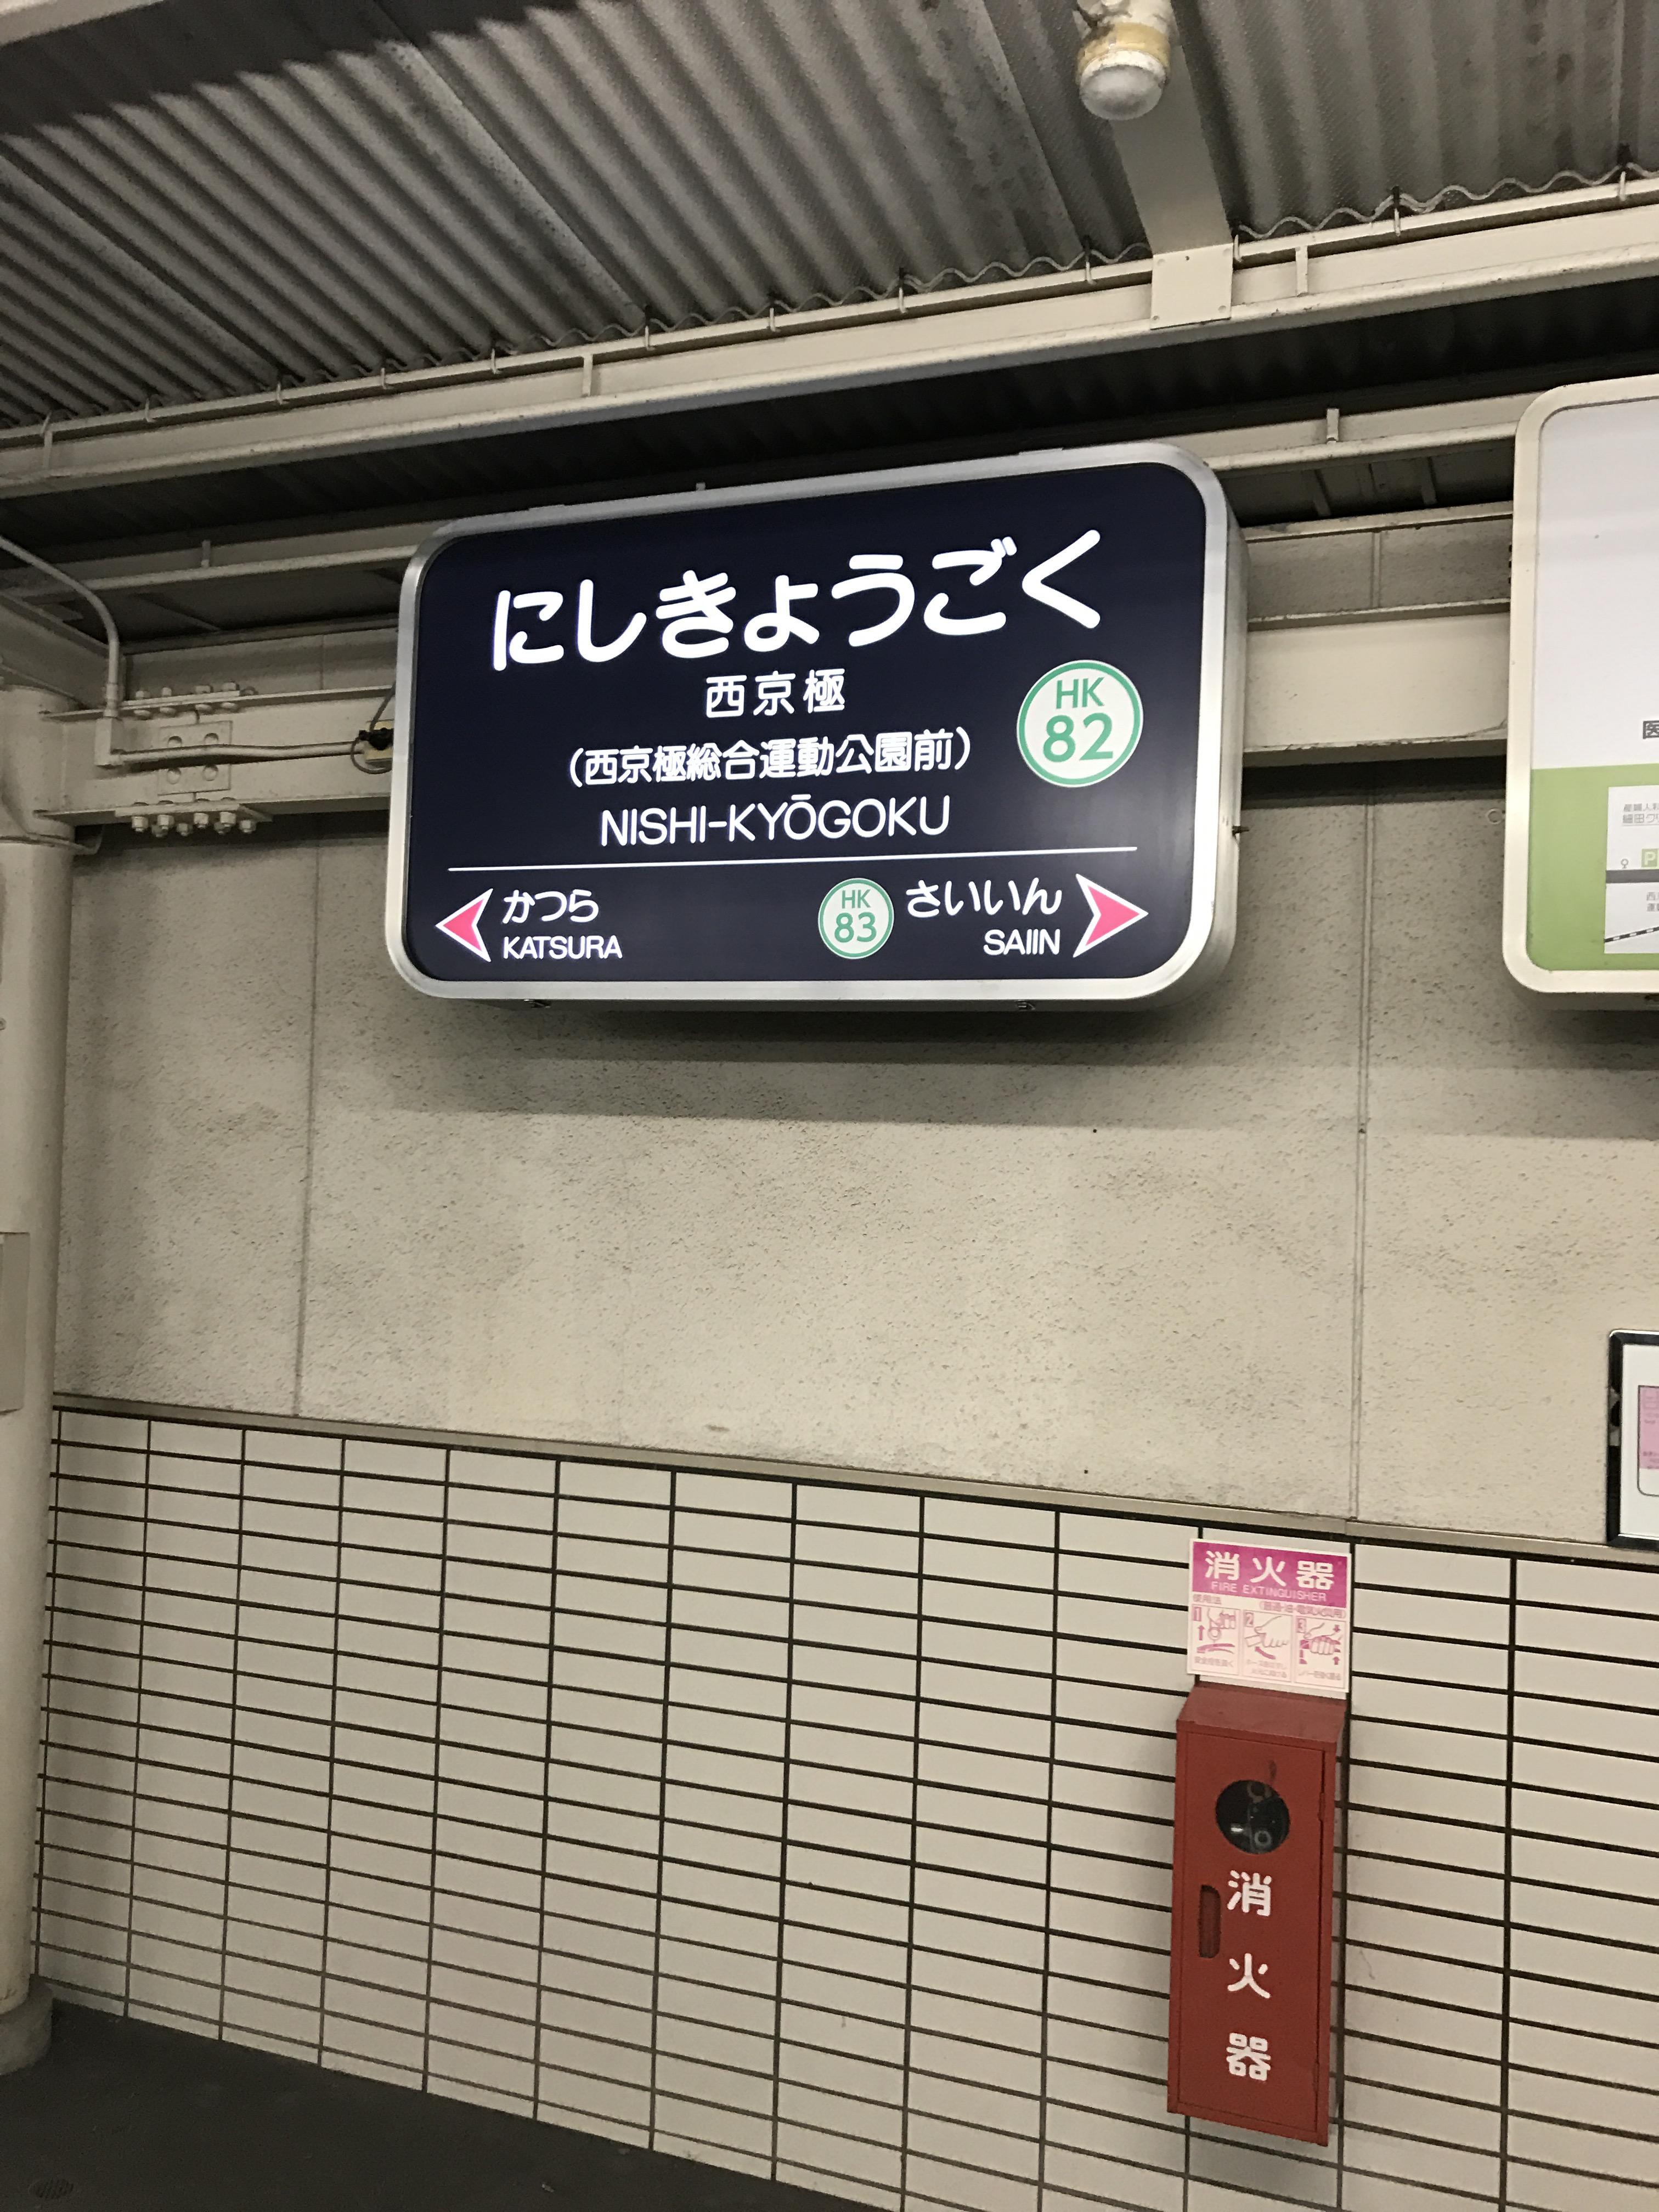 Apple PayのSuicaは阪急西京極でも使えます!